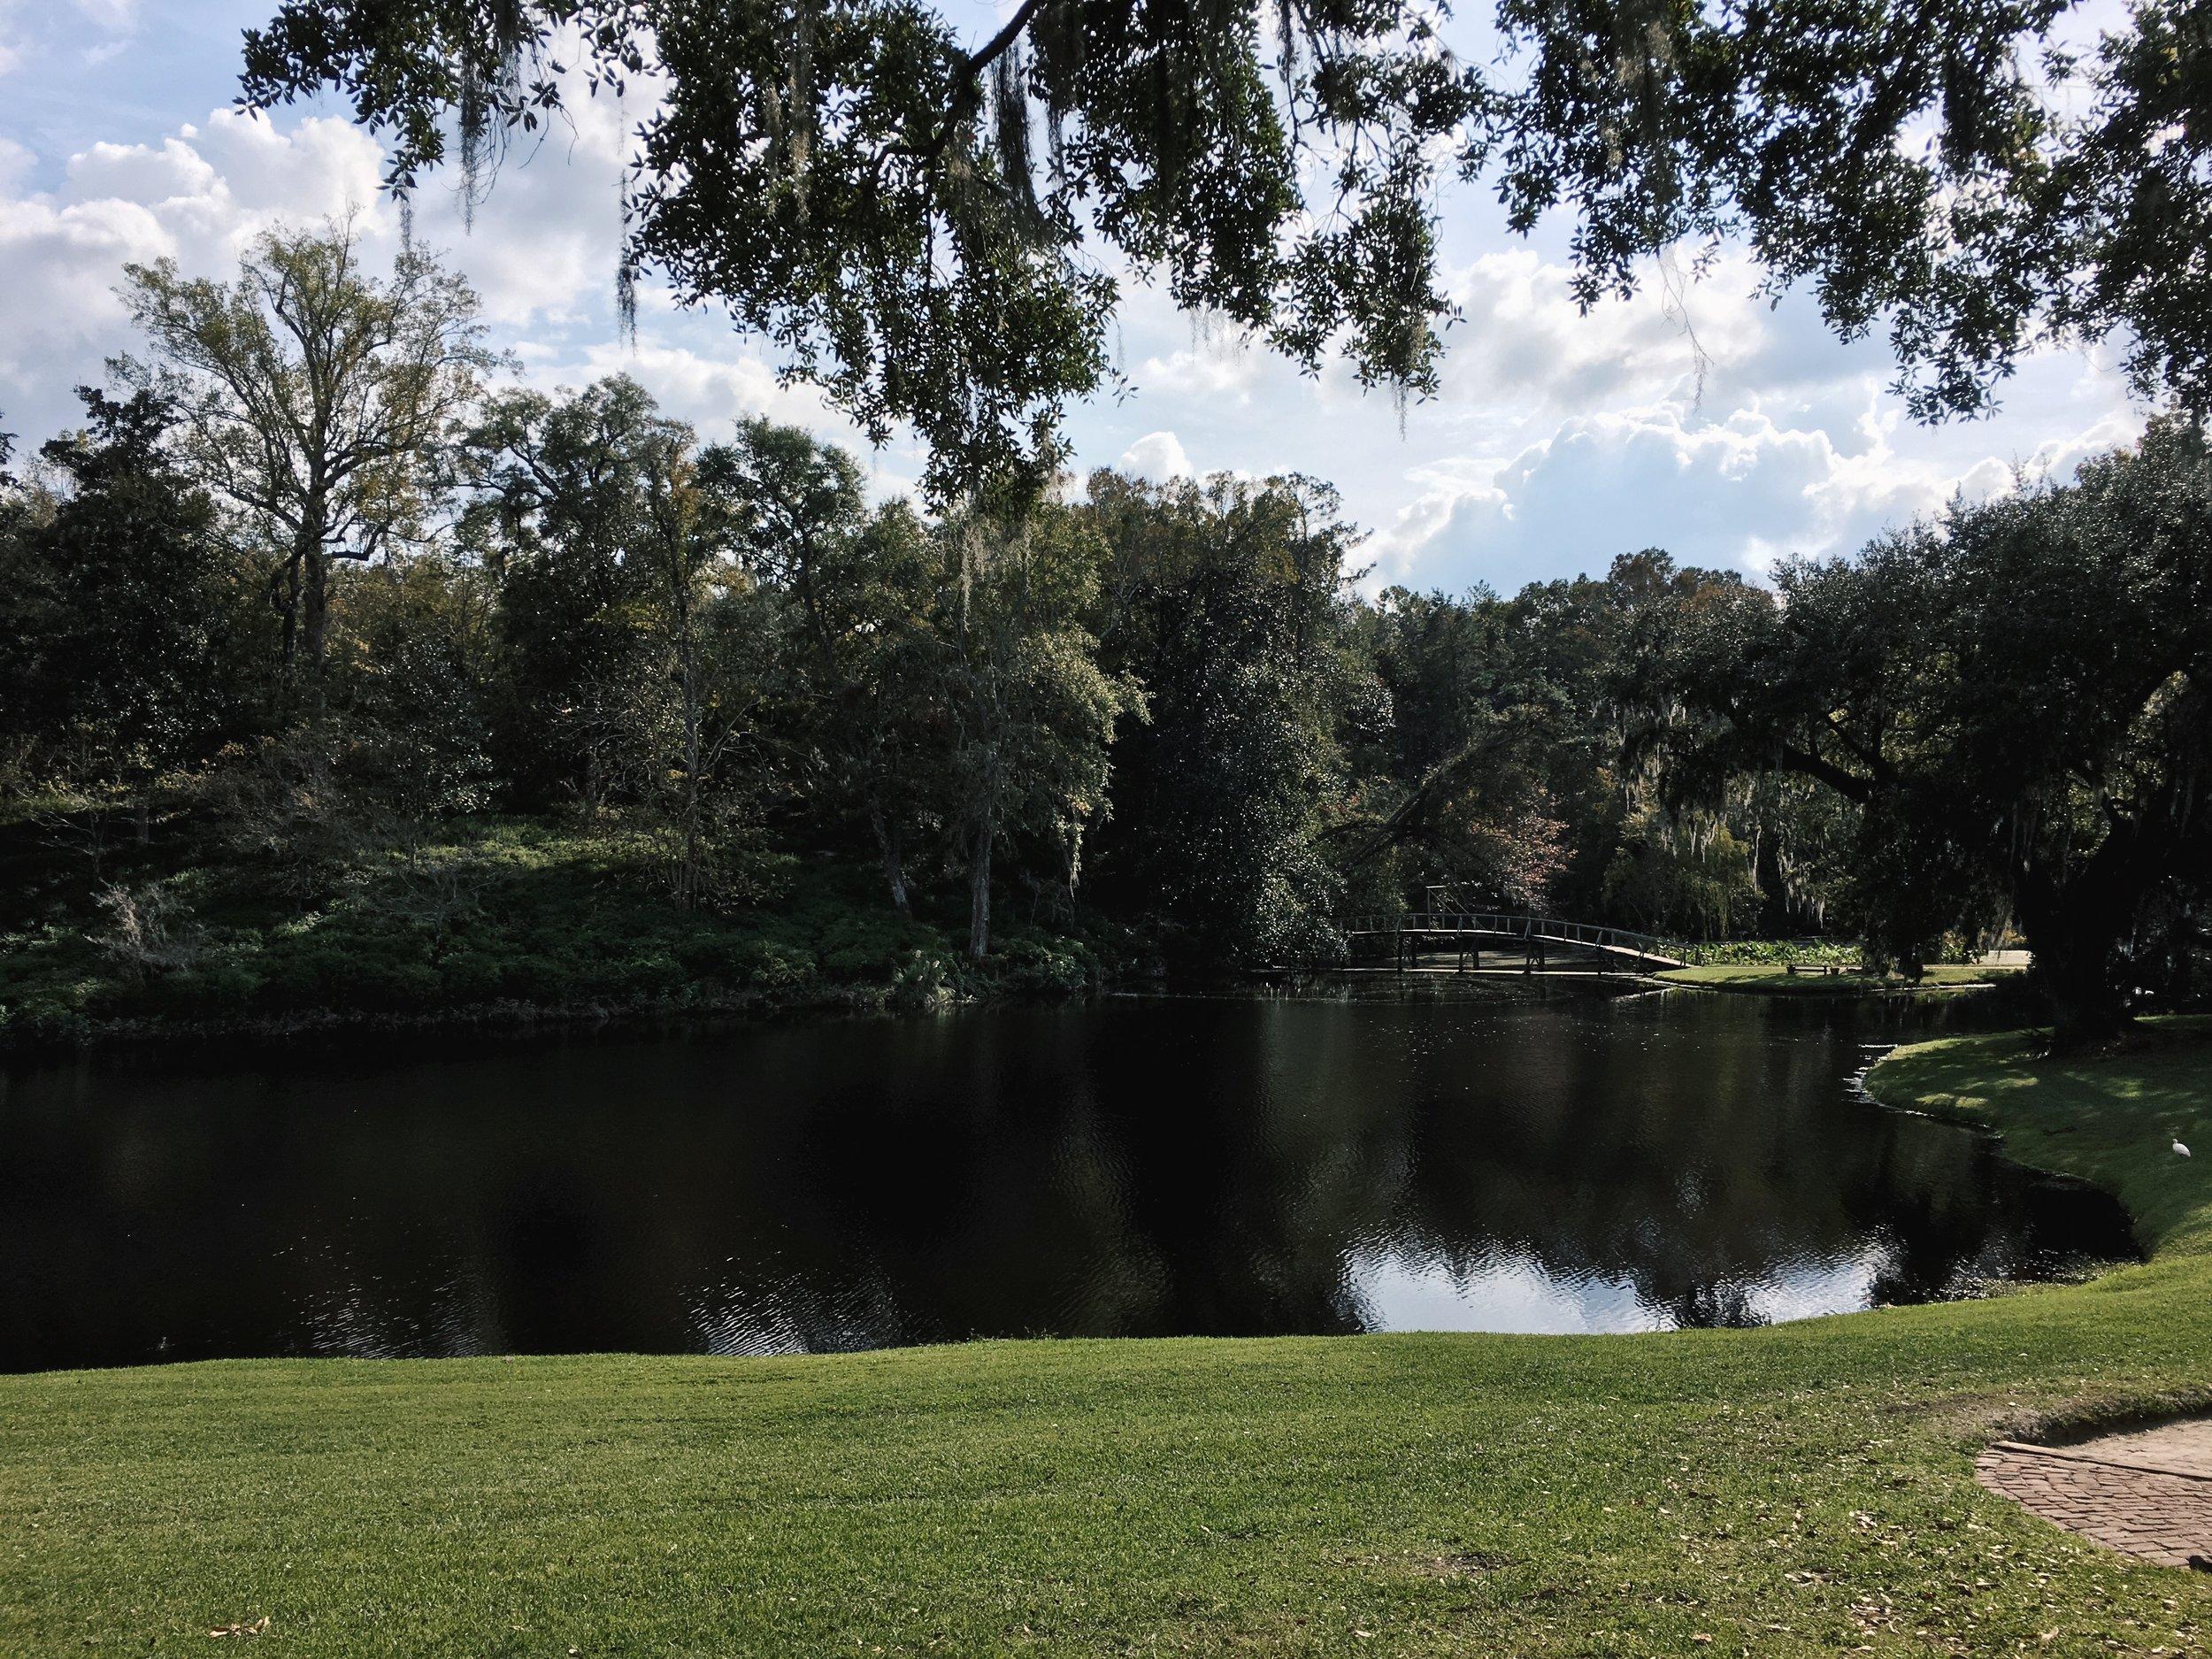 Photo by Julia Friedman of the lake at the Middleton Plantation in Charleston, South Carolina.